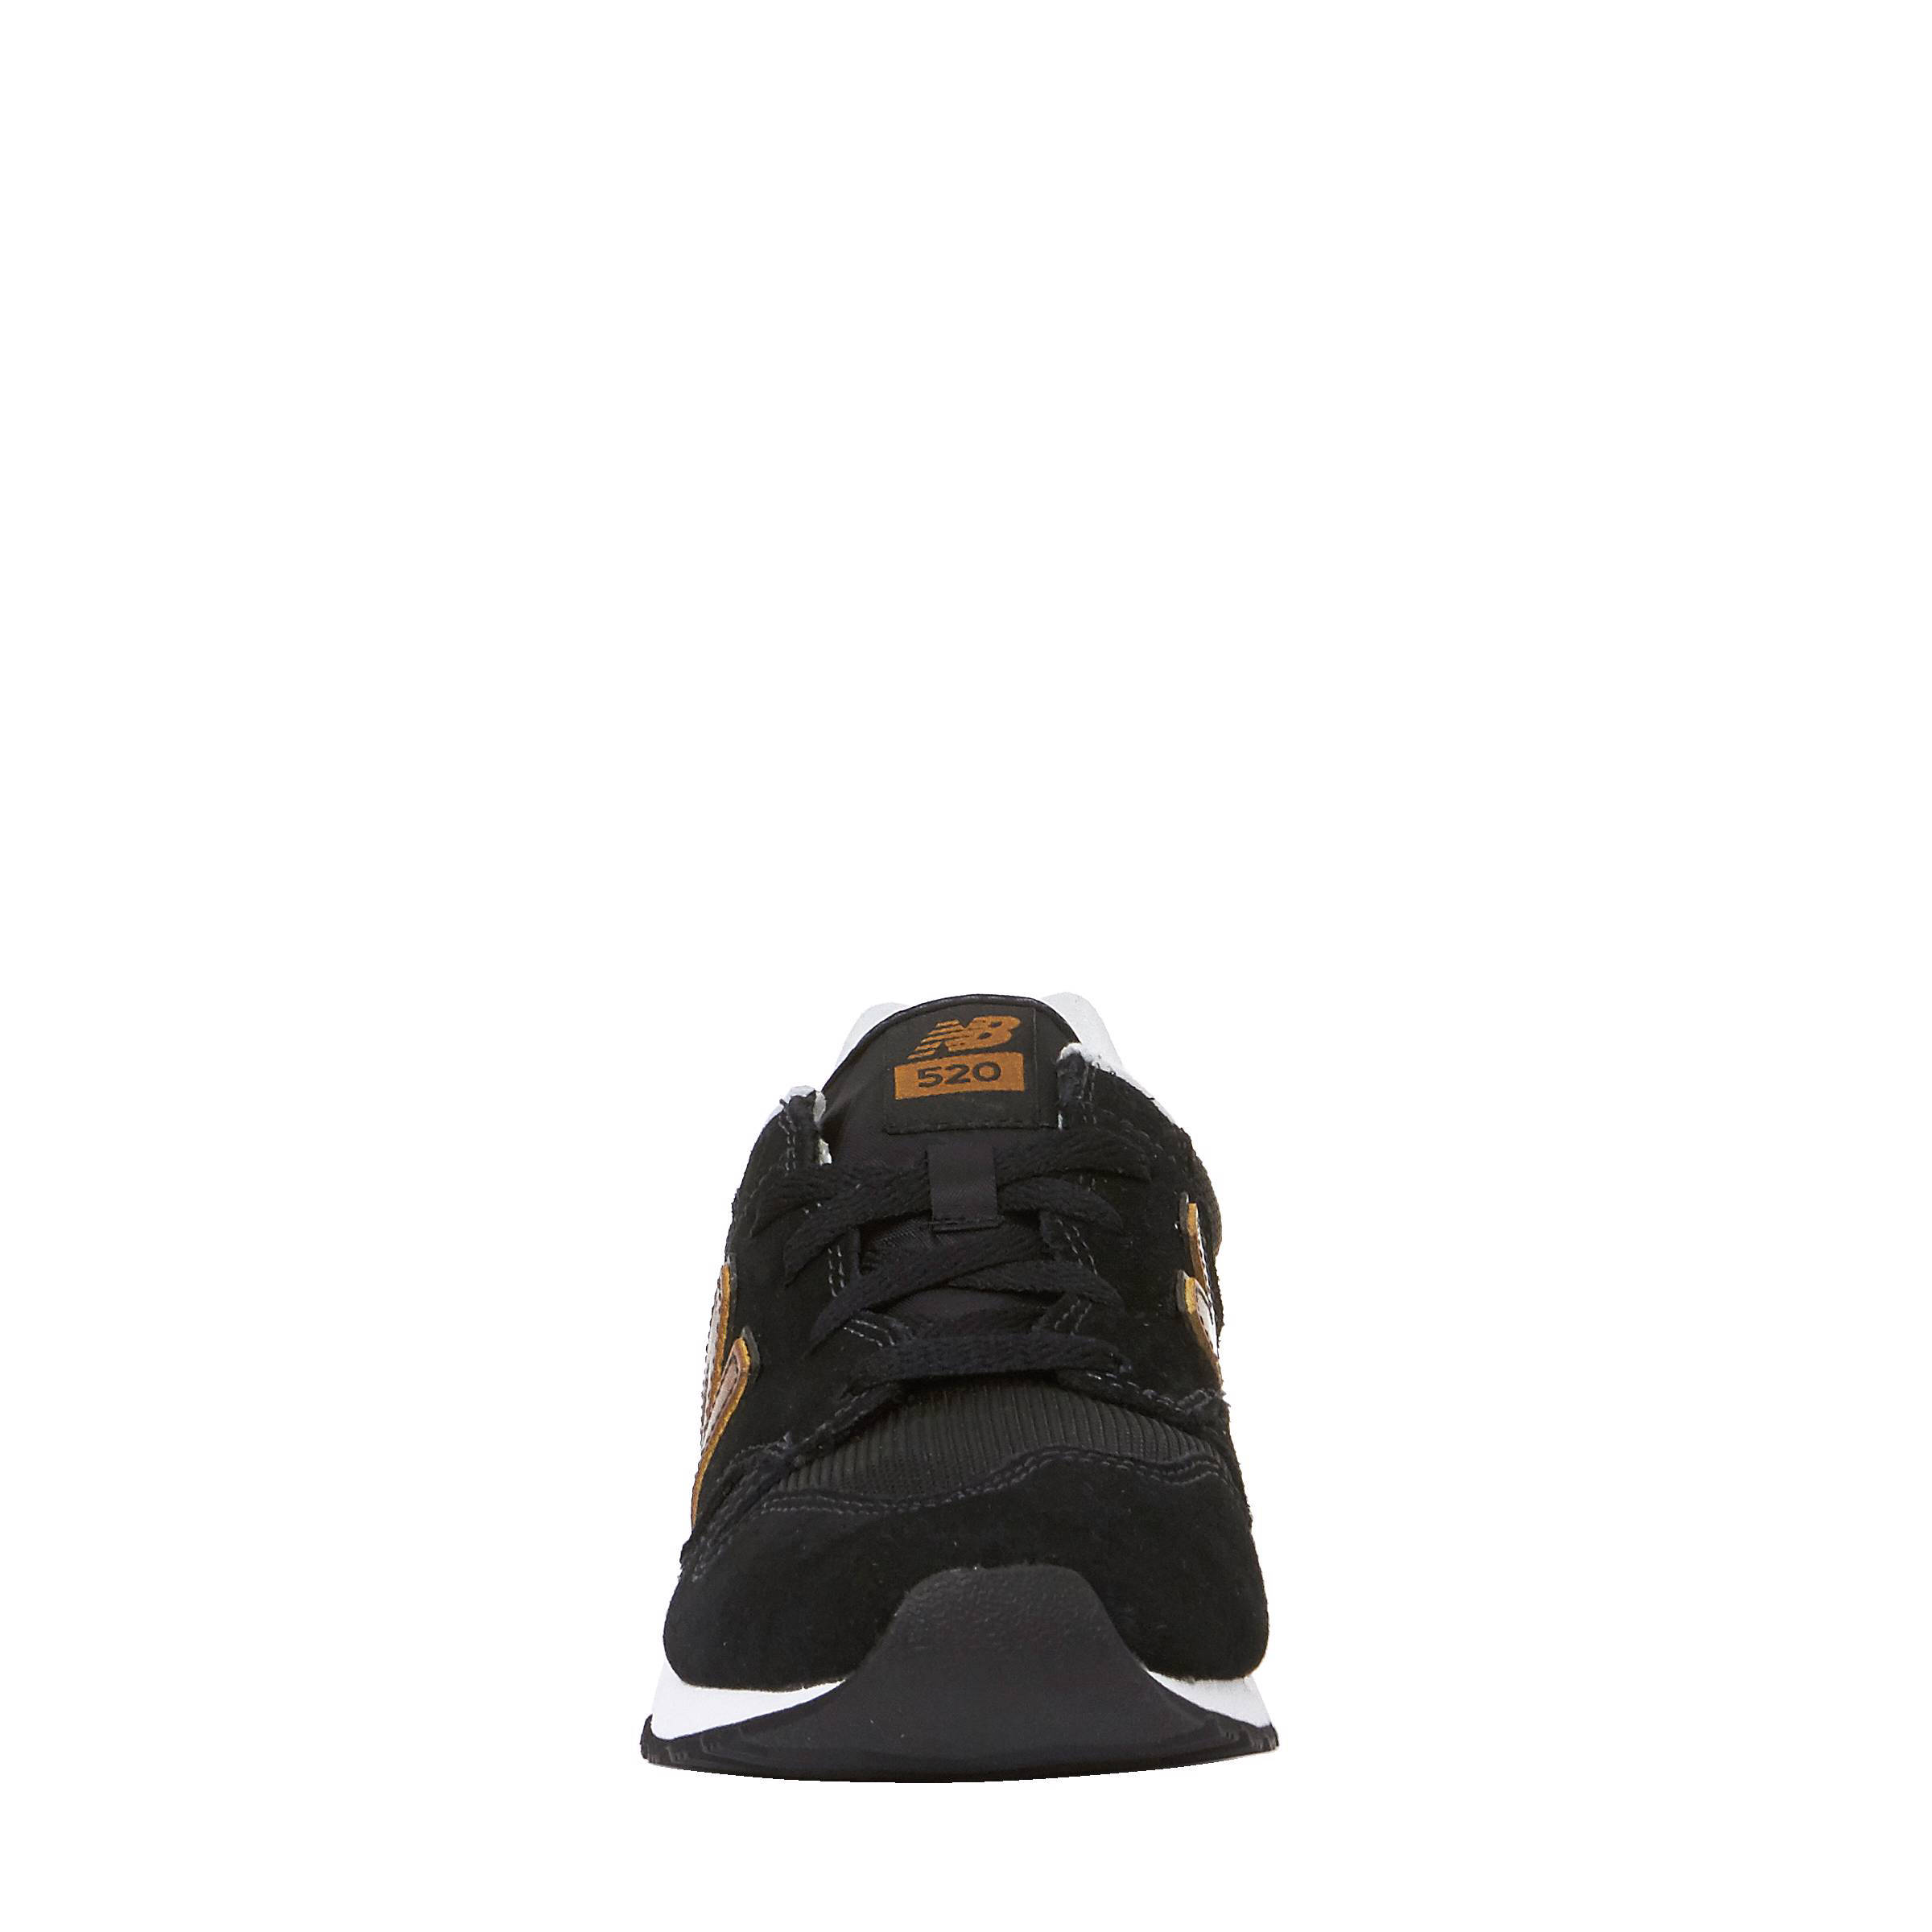 New Balance 520 sneakers | wehkamp